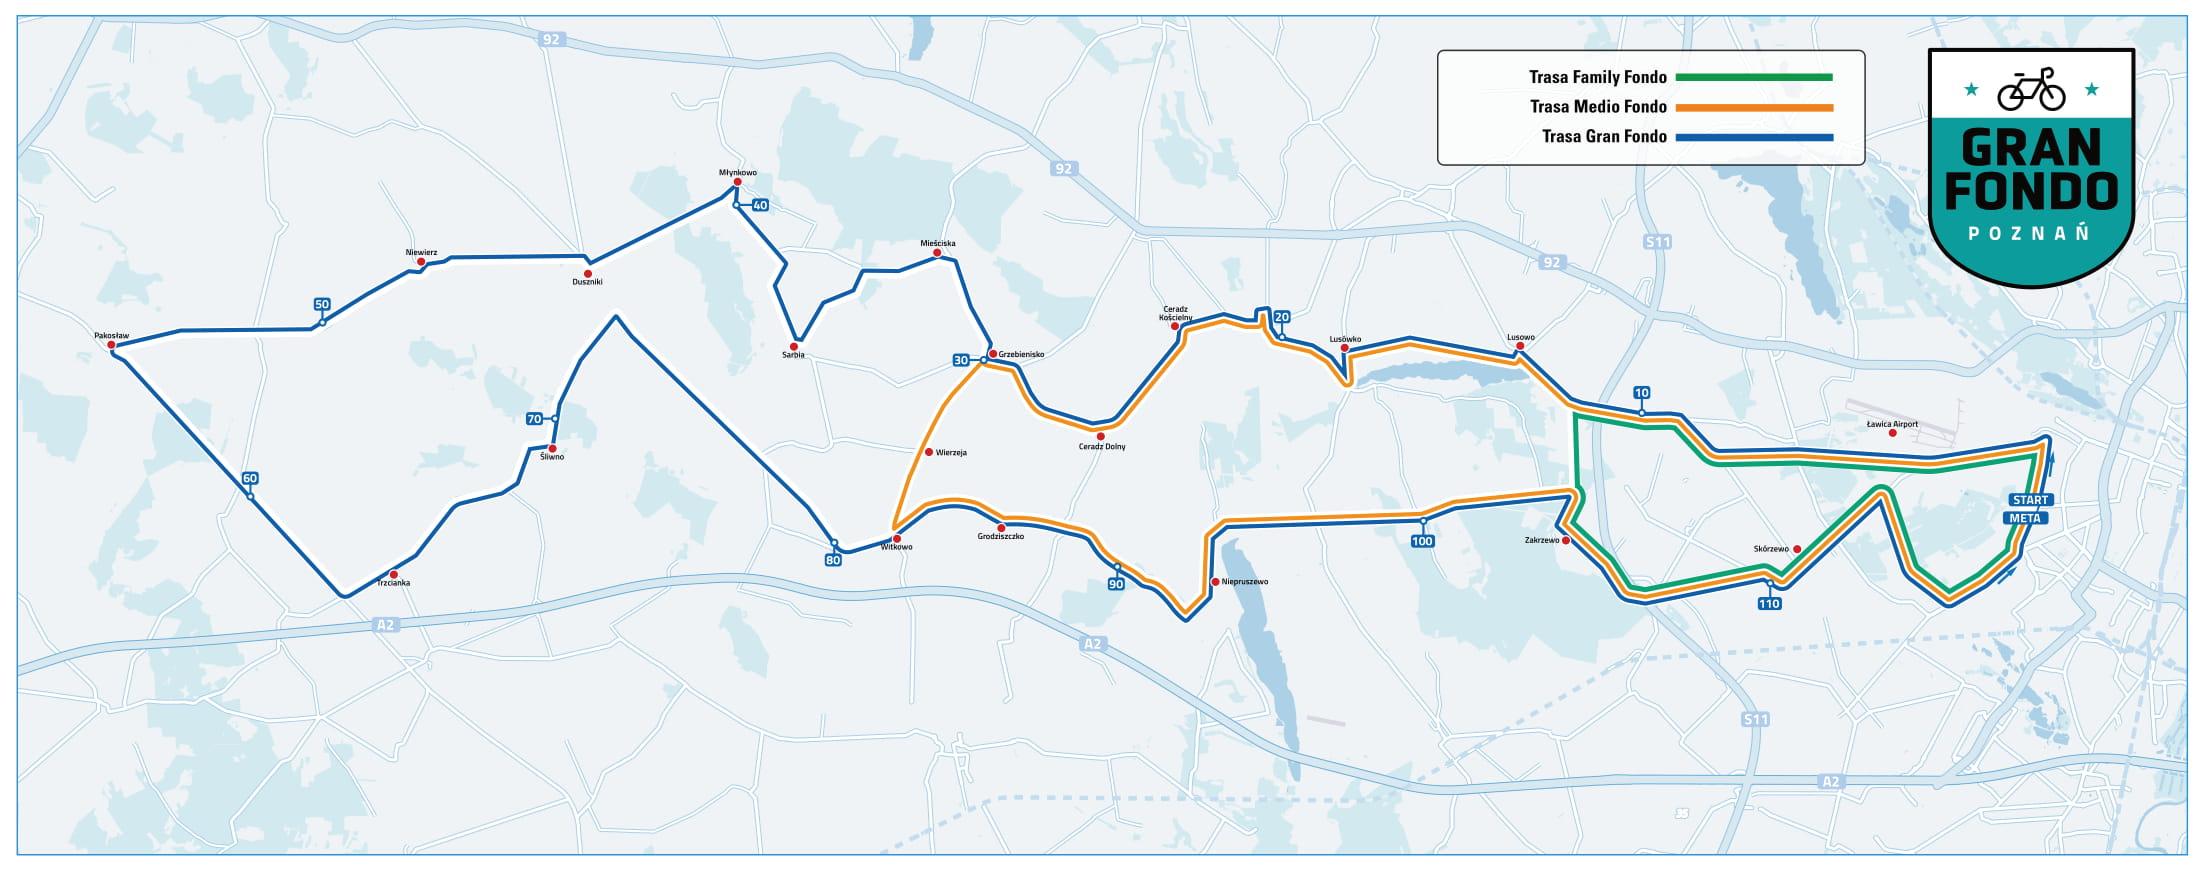 Gran Fondo Poznań 2021 trasy